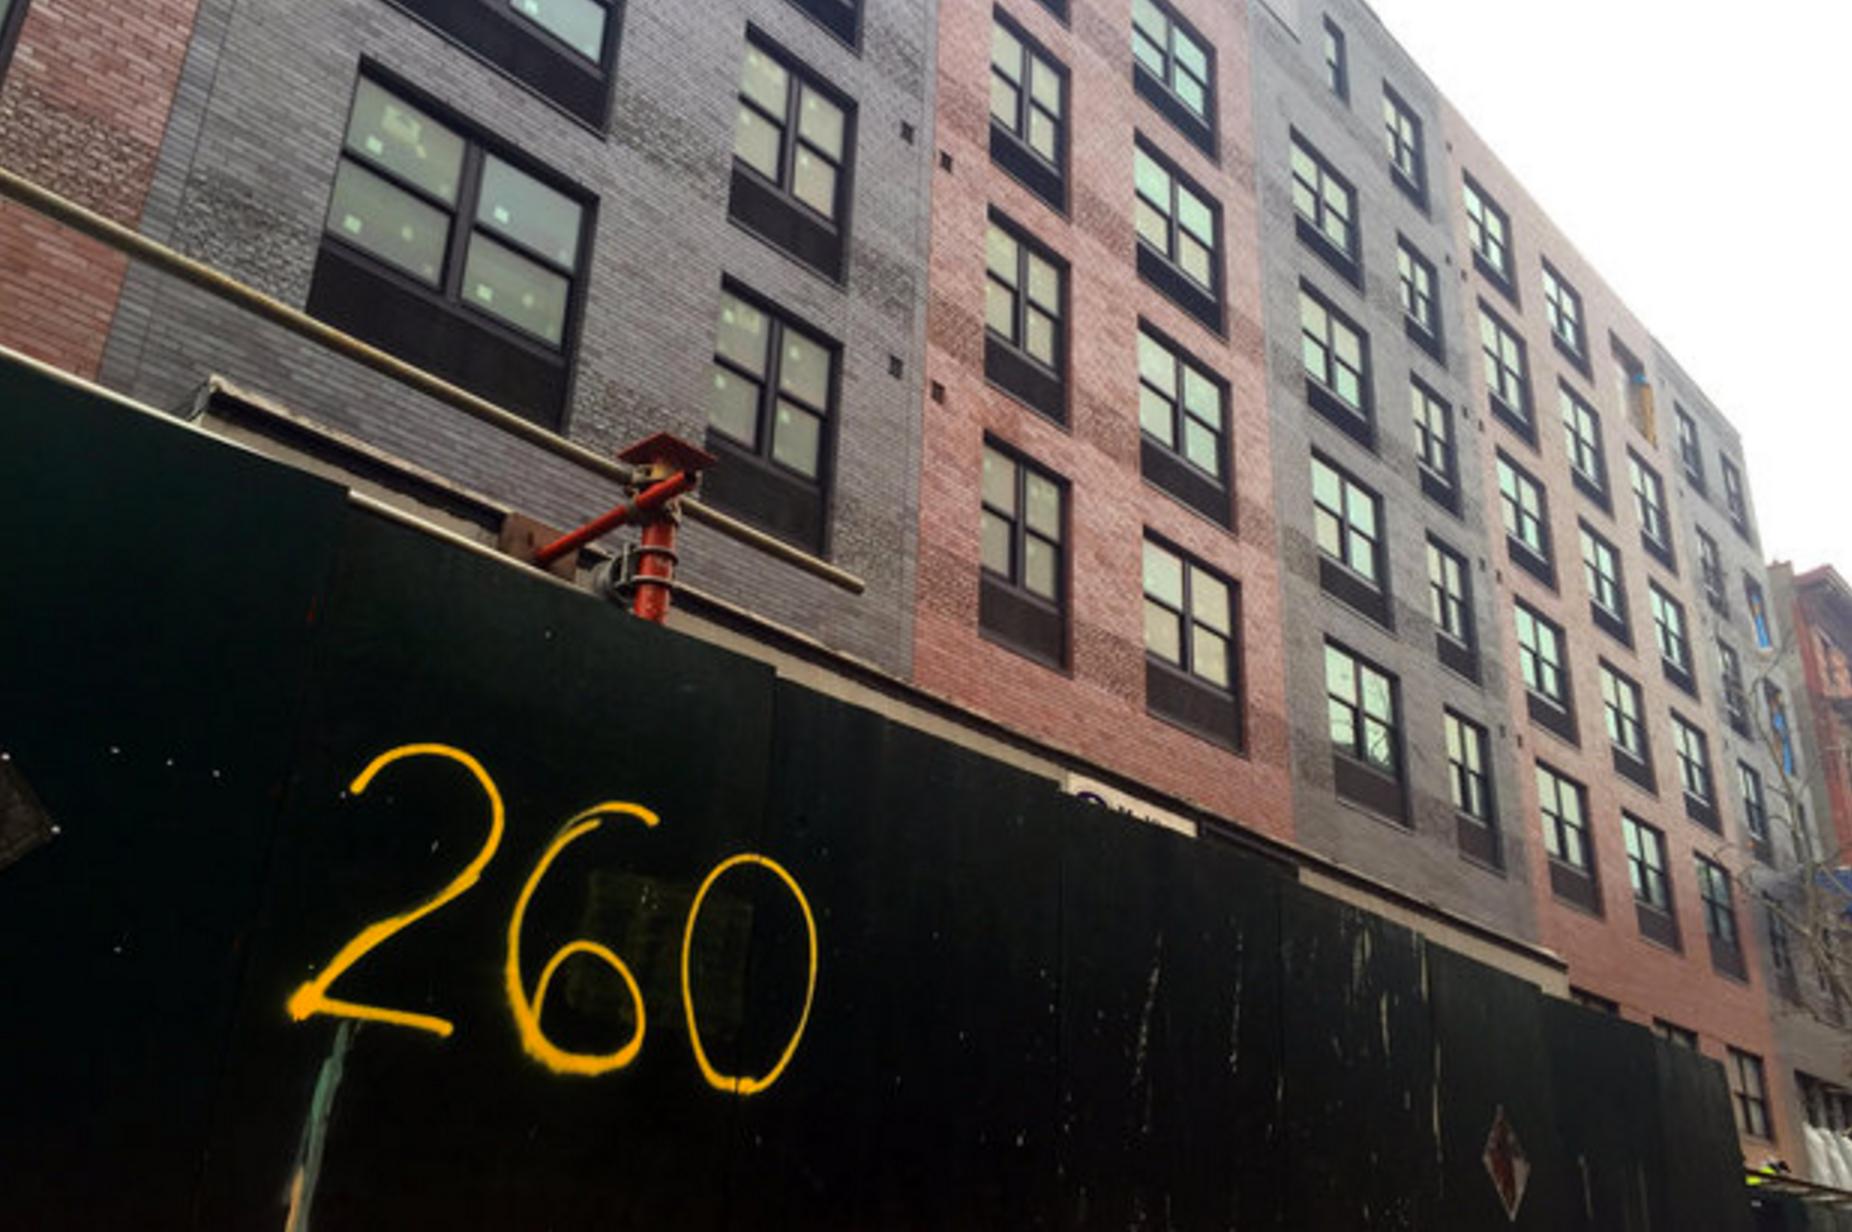 260 West 153rd Street